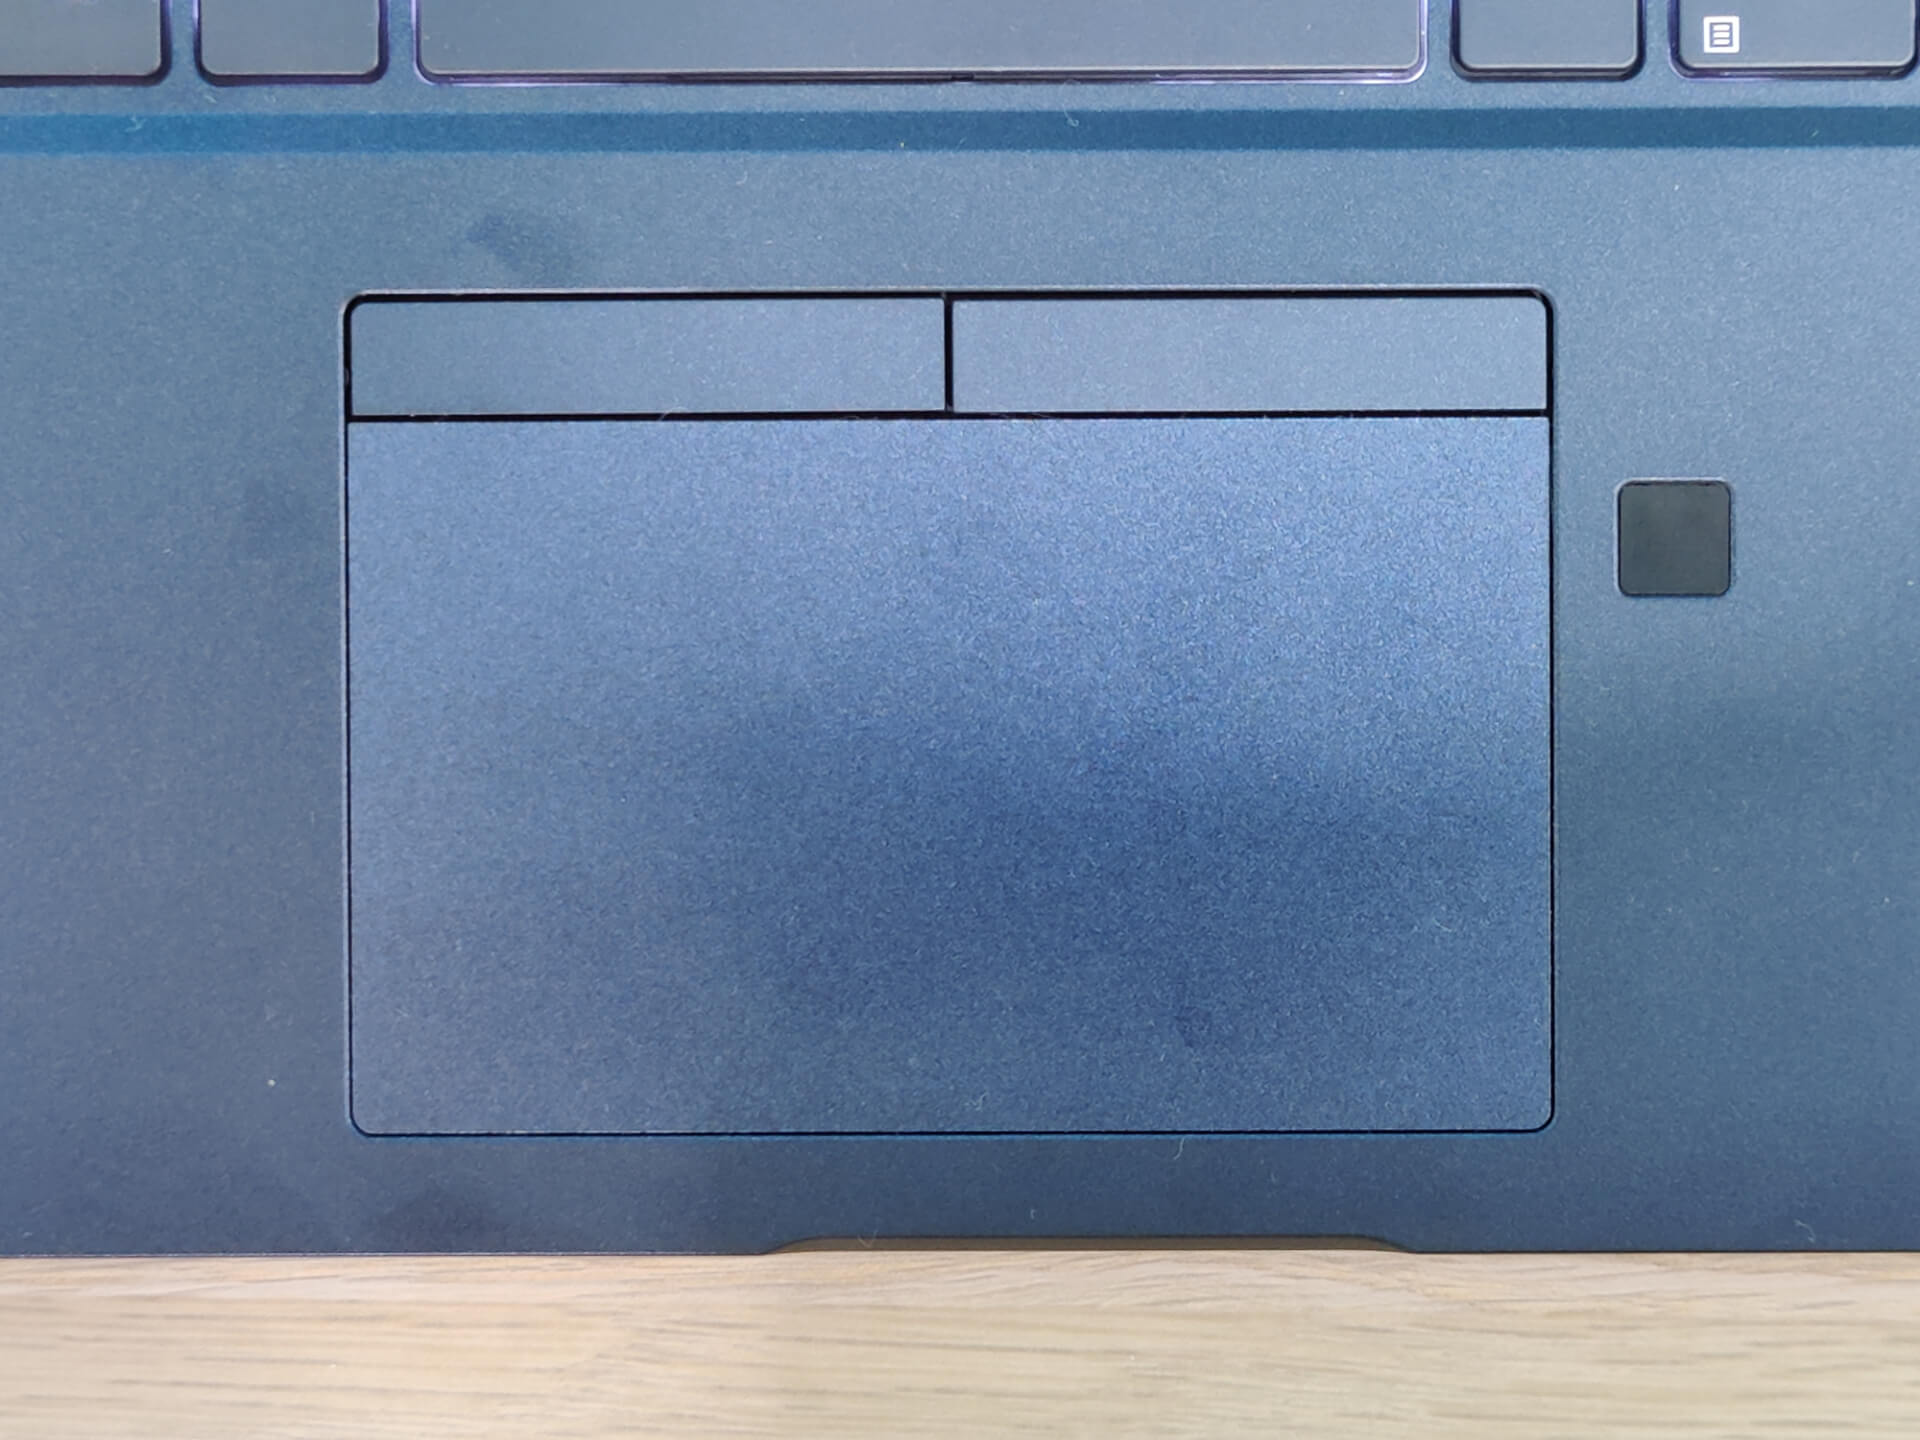 ASUS ExpertBook P2 P2451FB Trackpad Fingerprint Reader